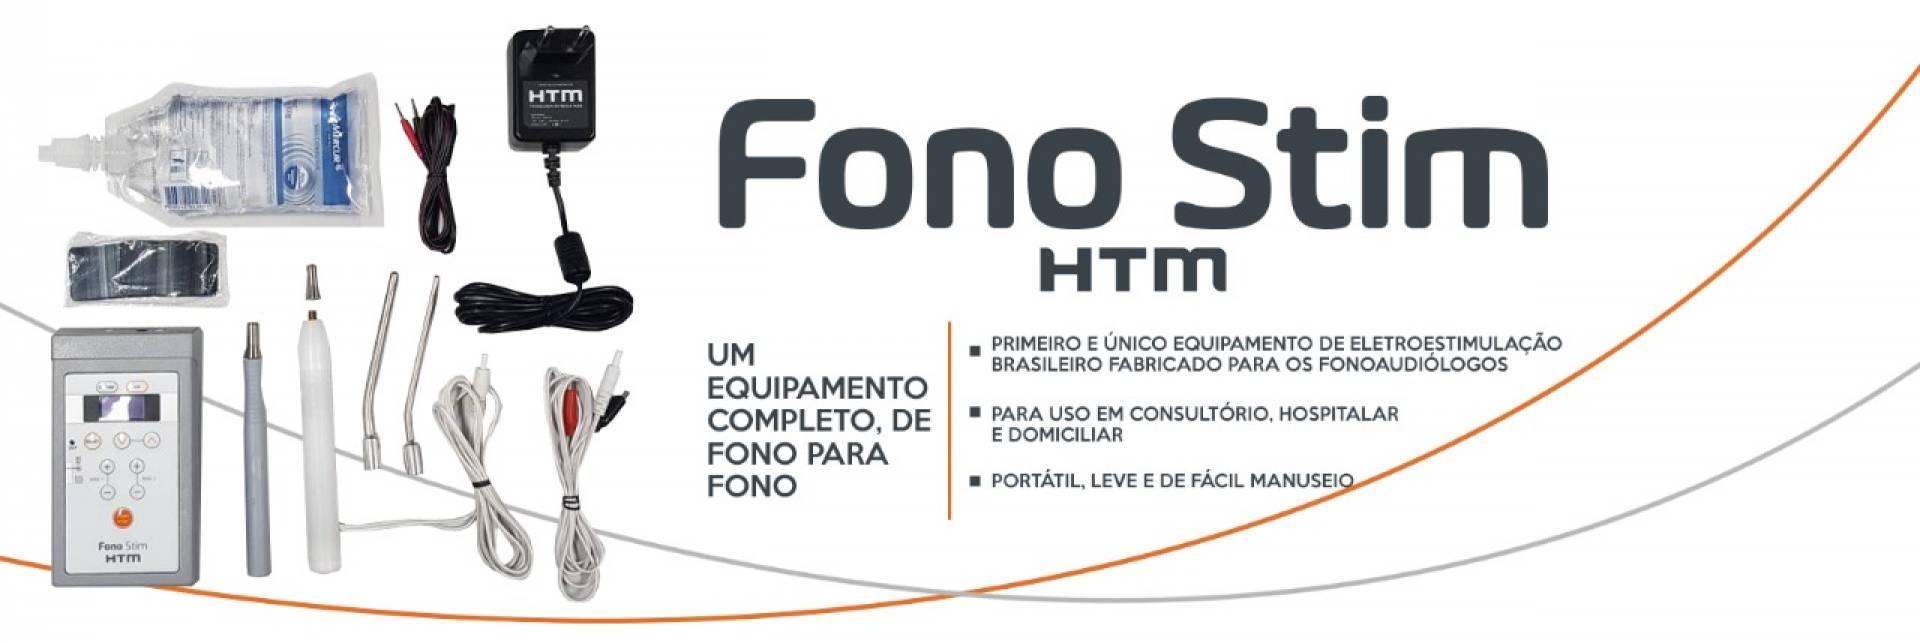 banner fono stim site 2